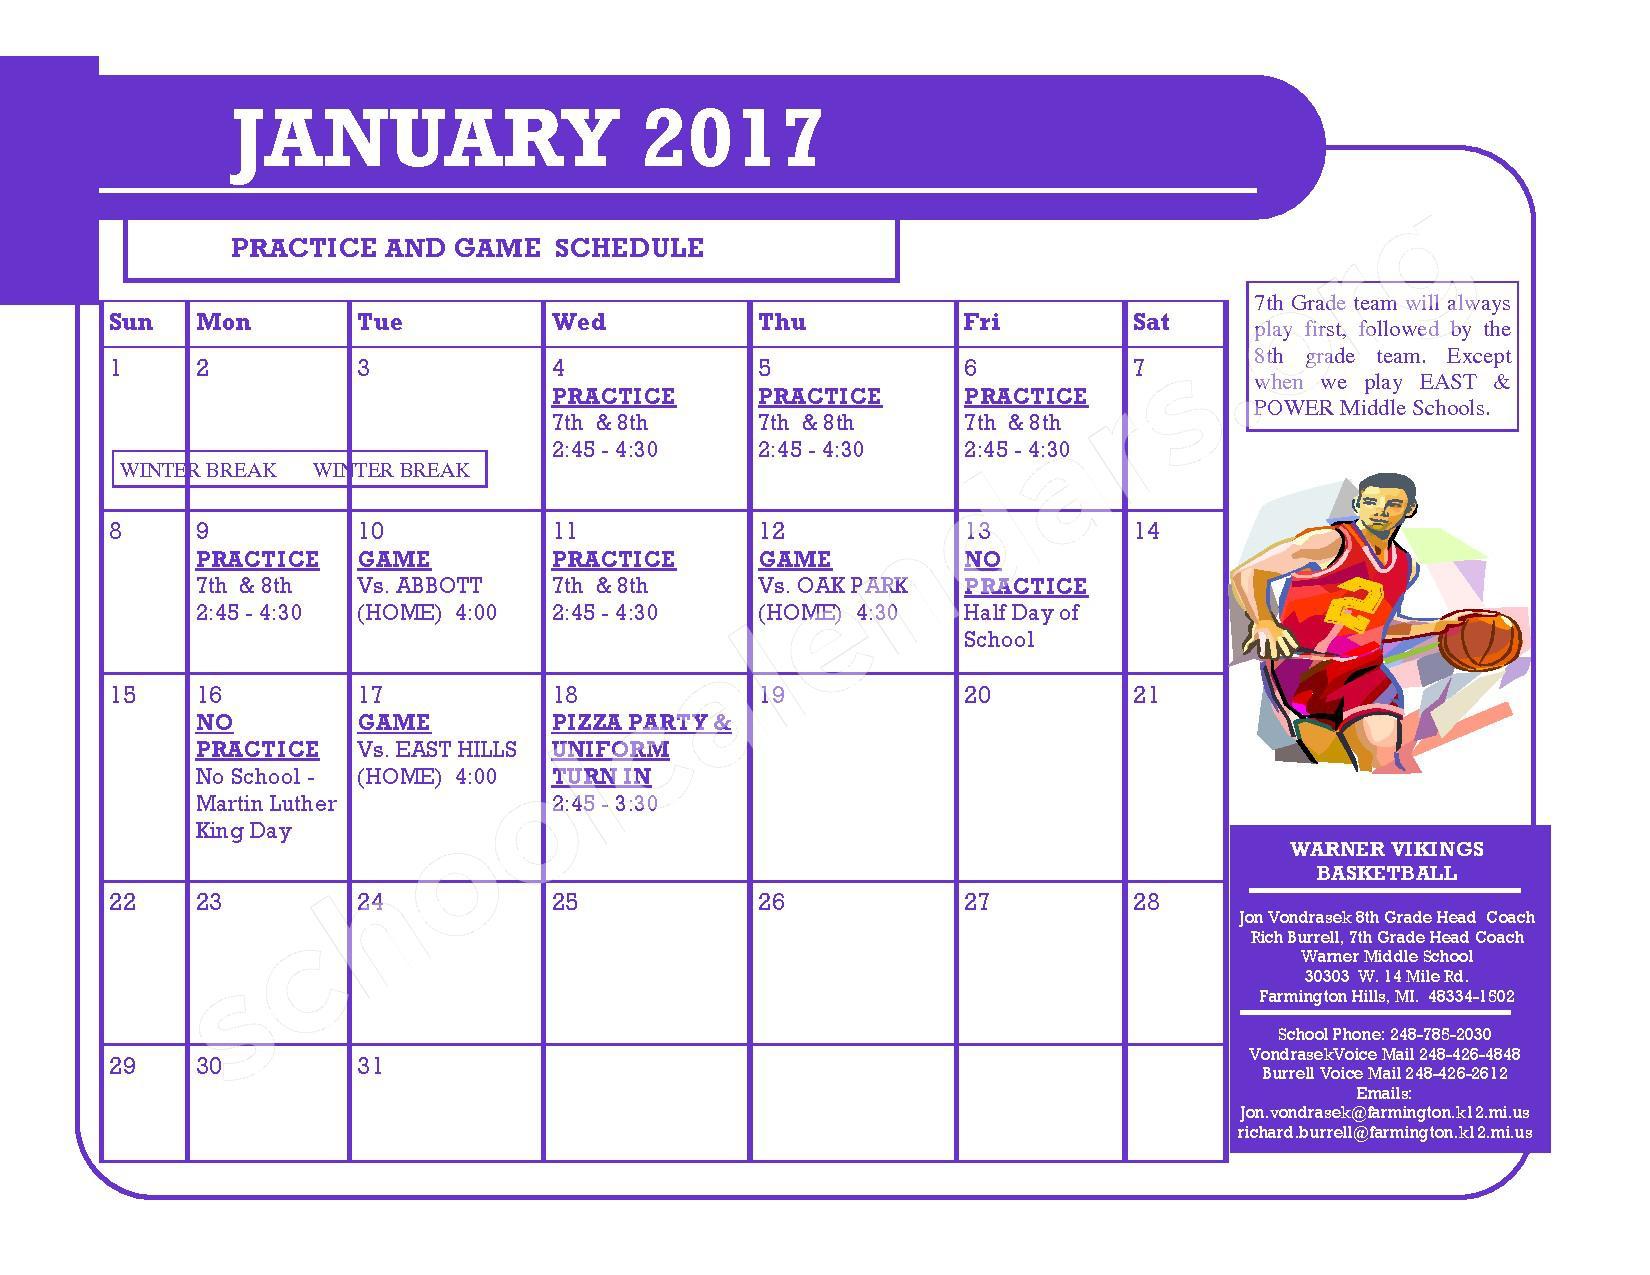 2016 - 2017 District Calendar – Kenbrook Elementary School – page 3